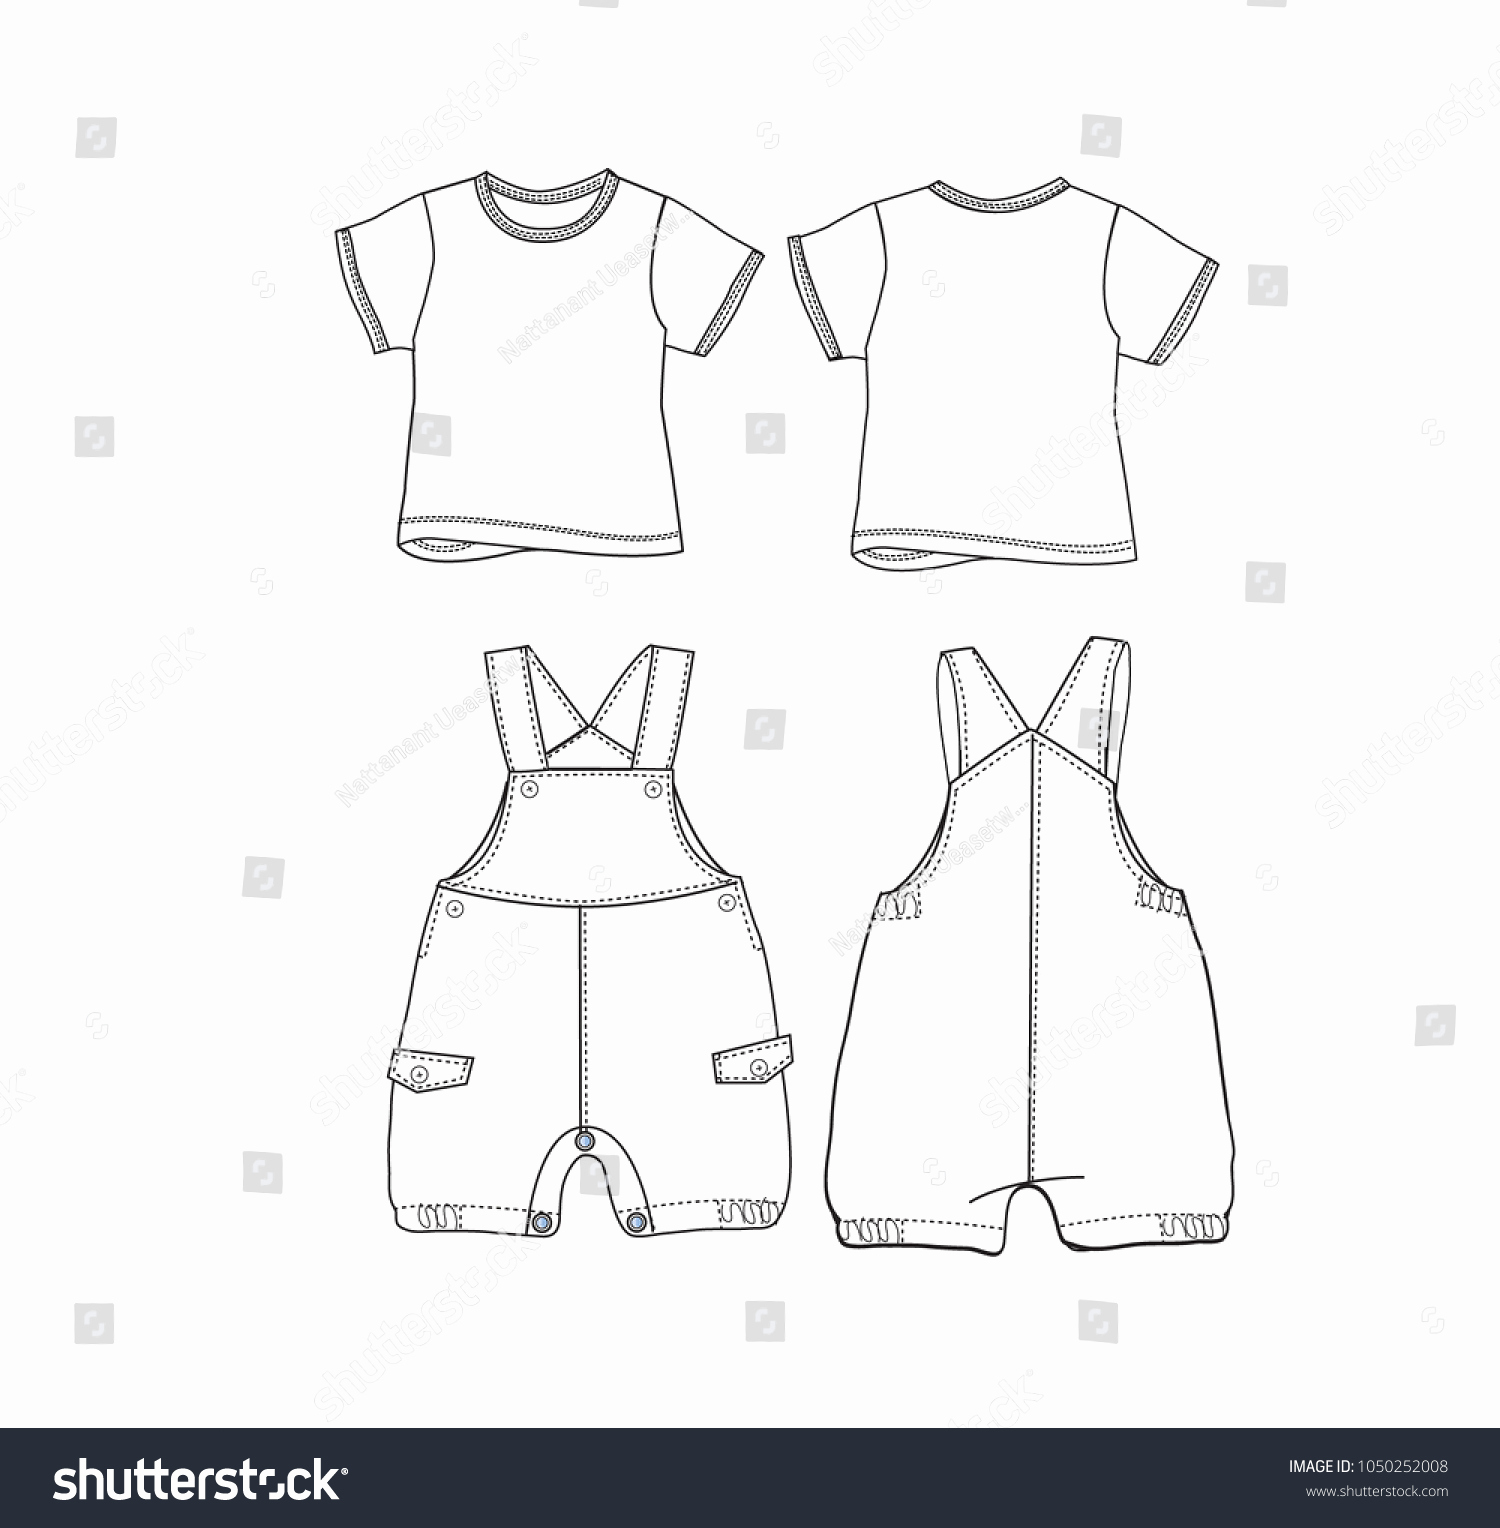 1500x1528 Baby Clothing Website Templates New Tshirt Jumper Vector Design